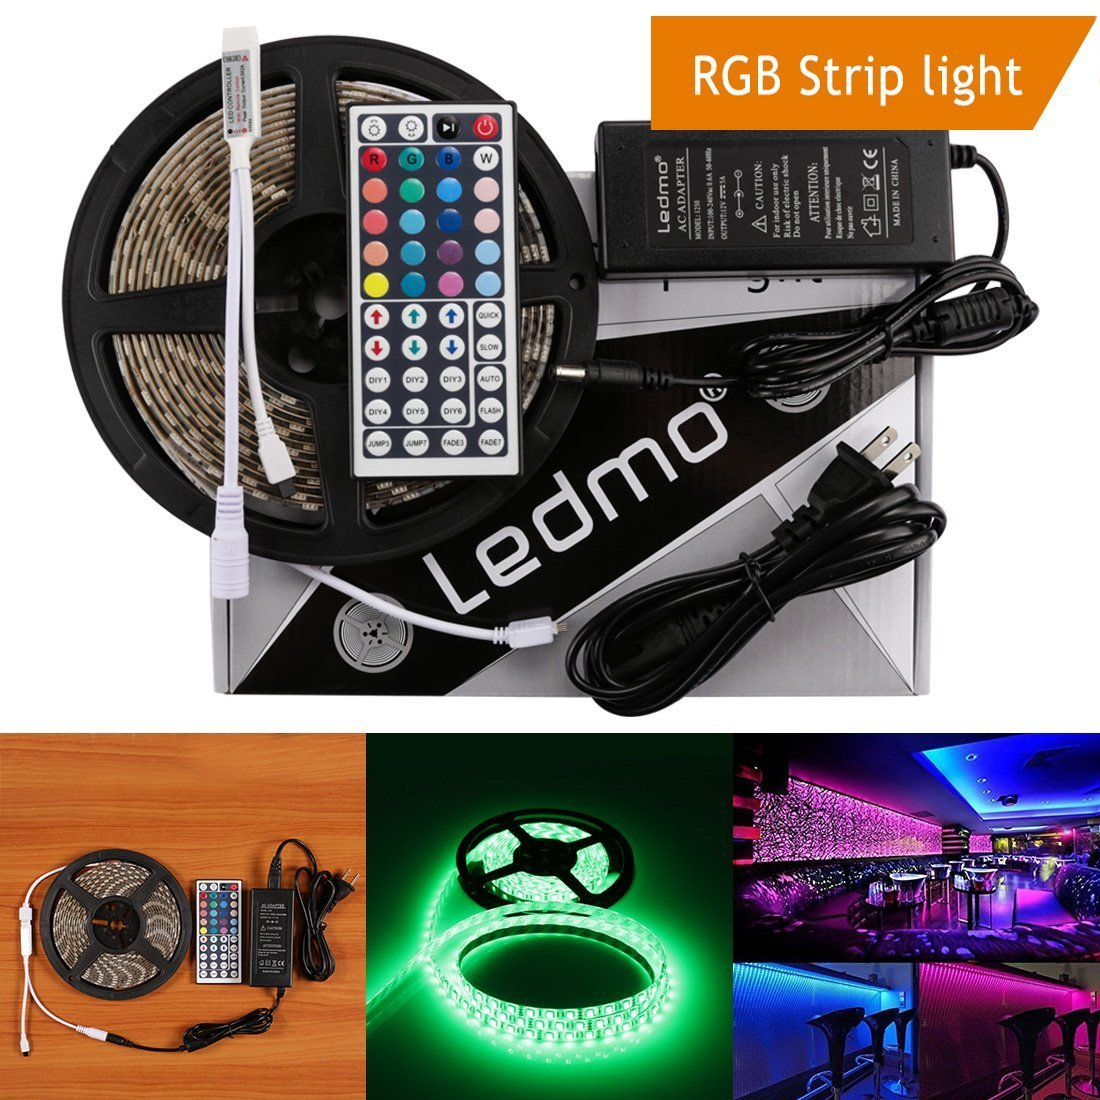 LEDMO LED Strip Lights,SMD 5050 300 LEDs RGB LED Strips 16.4Ft Waterproof Flexible Strip Color Changing LED Light Strip With 44Keys IR Remote Controller And 12V 5A Power Supply